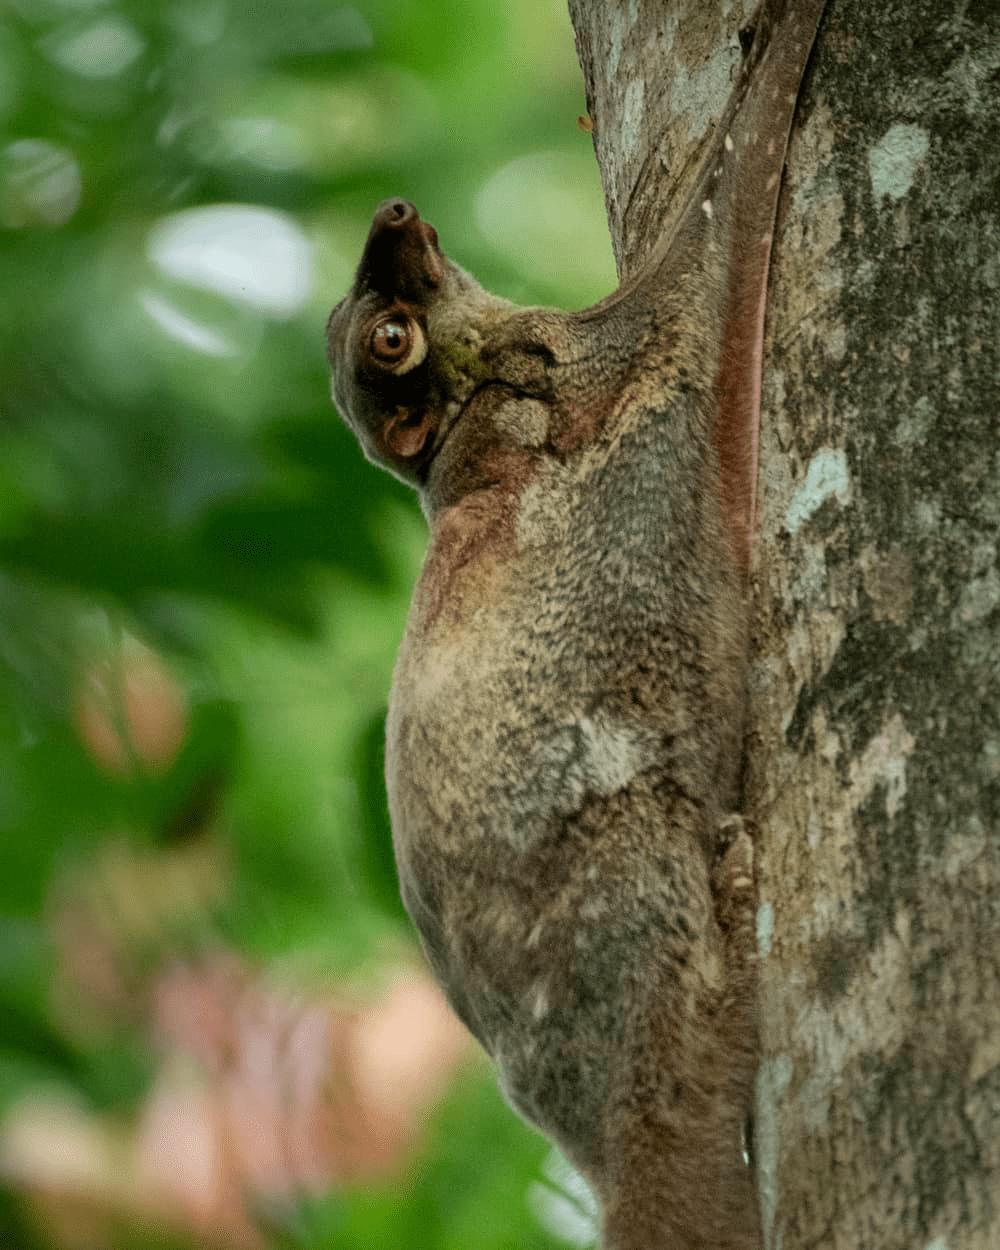 hindhede nature park - flying lemur